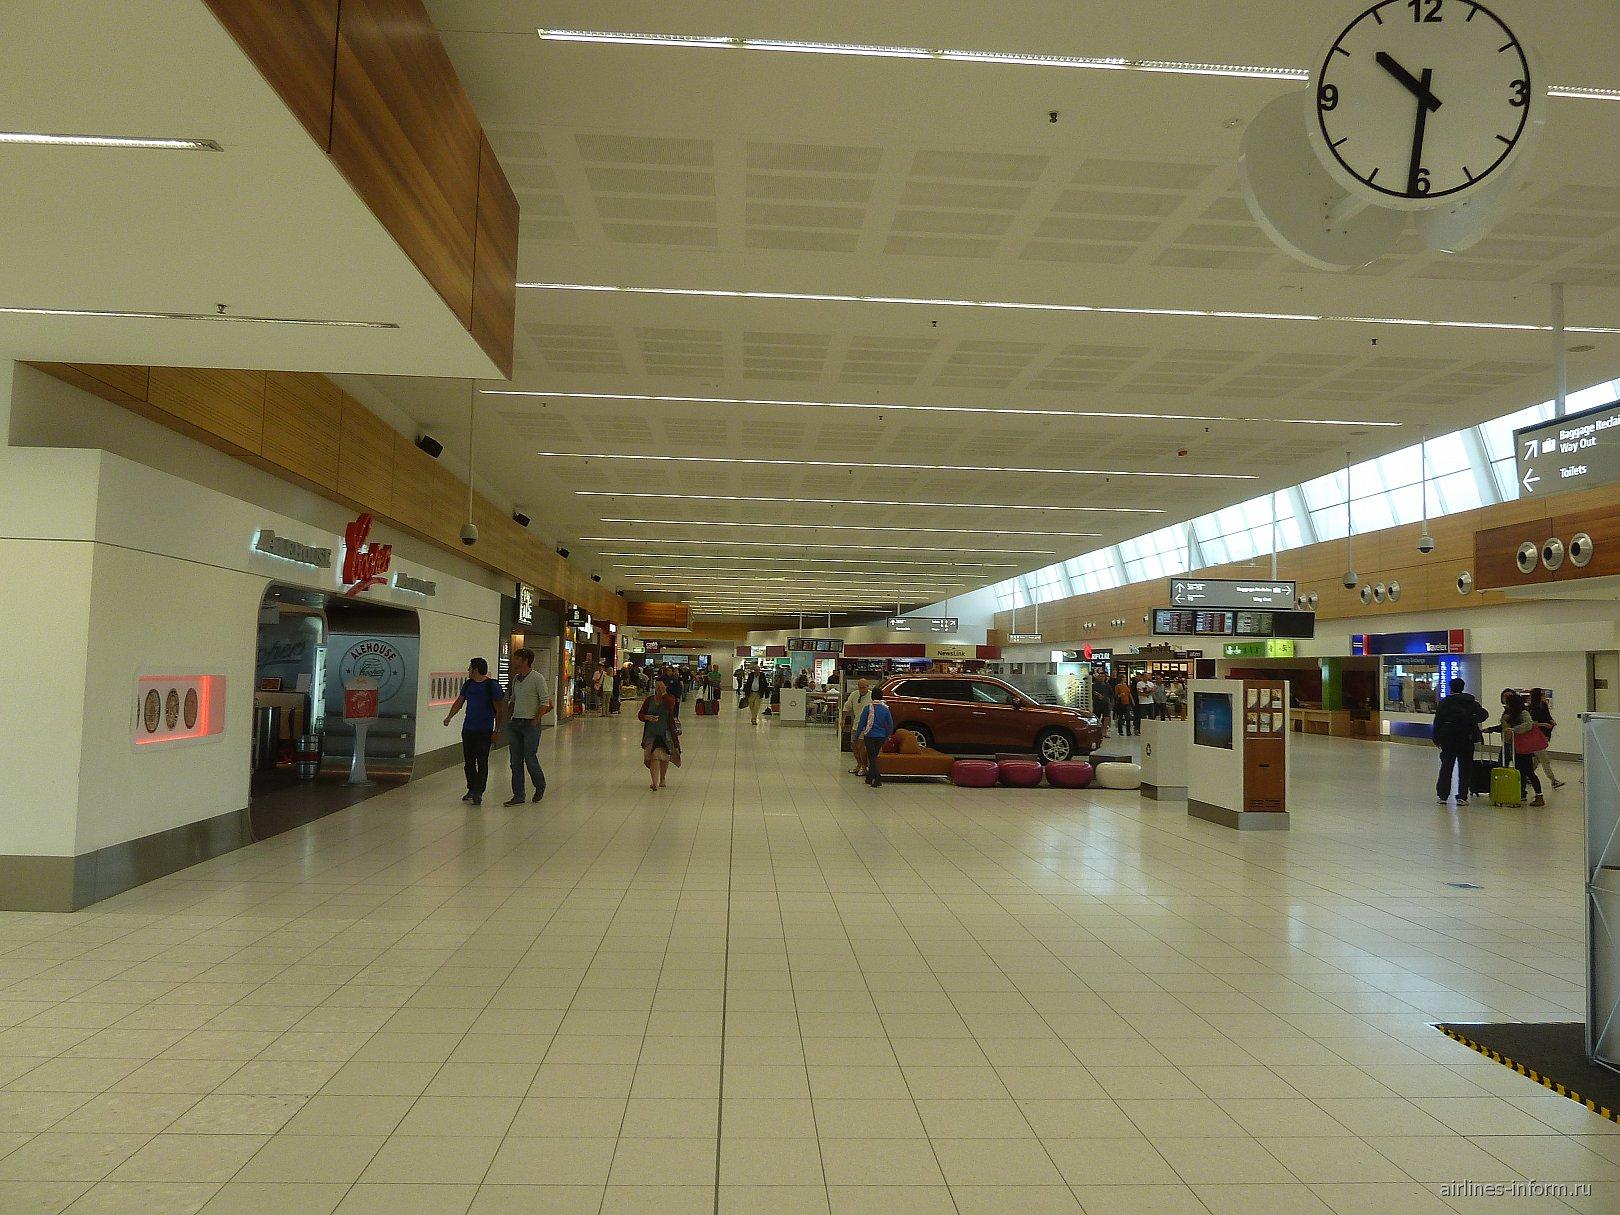 Чистая зона в аэропорту Аделаида